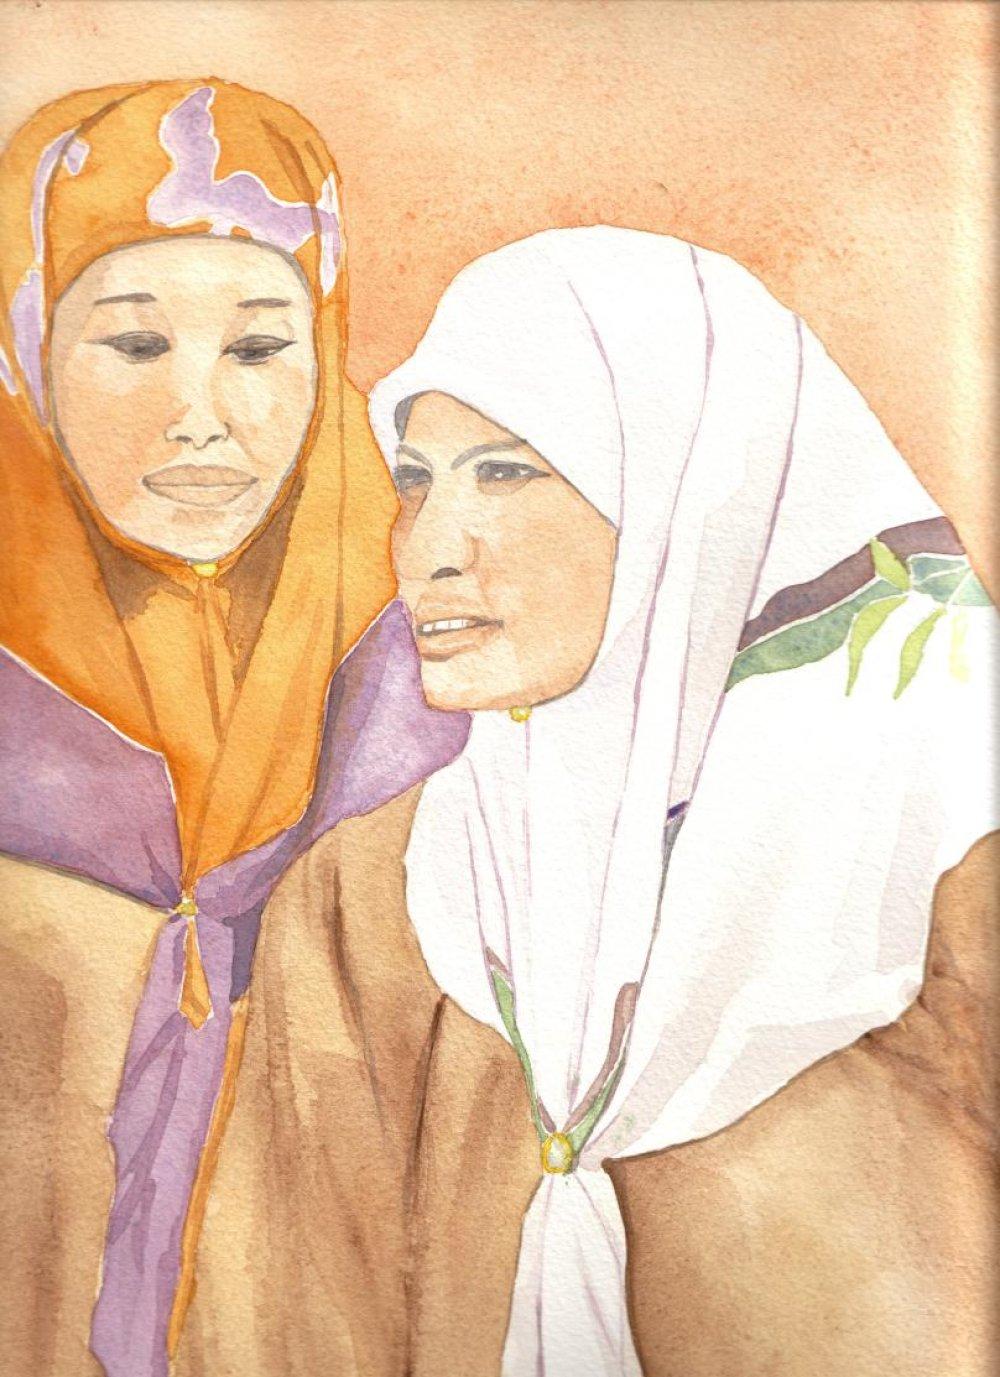 Jeunes femmes de Langkawi, Malaisie.